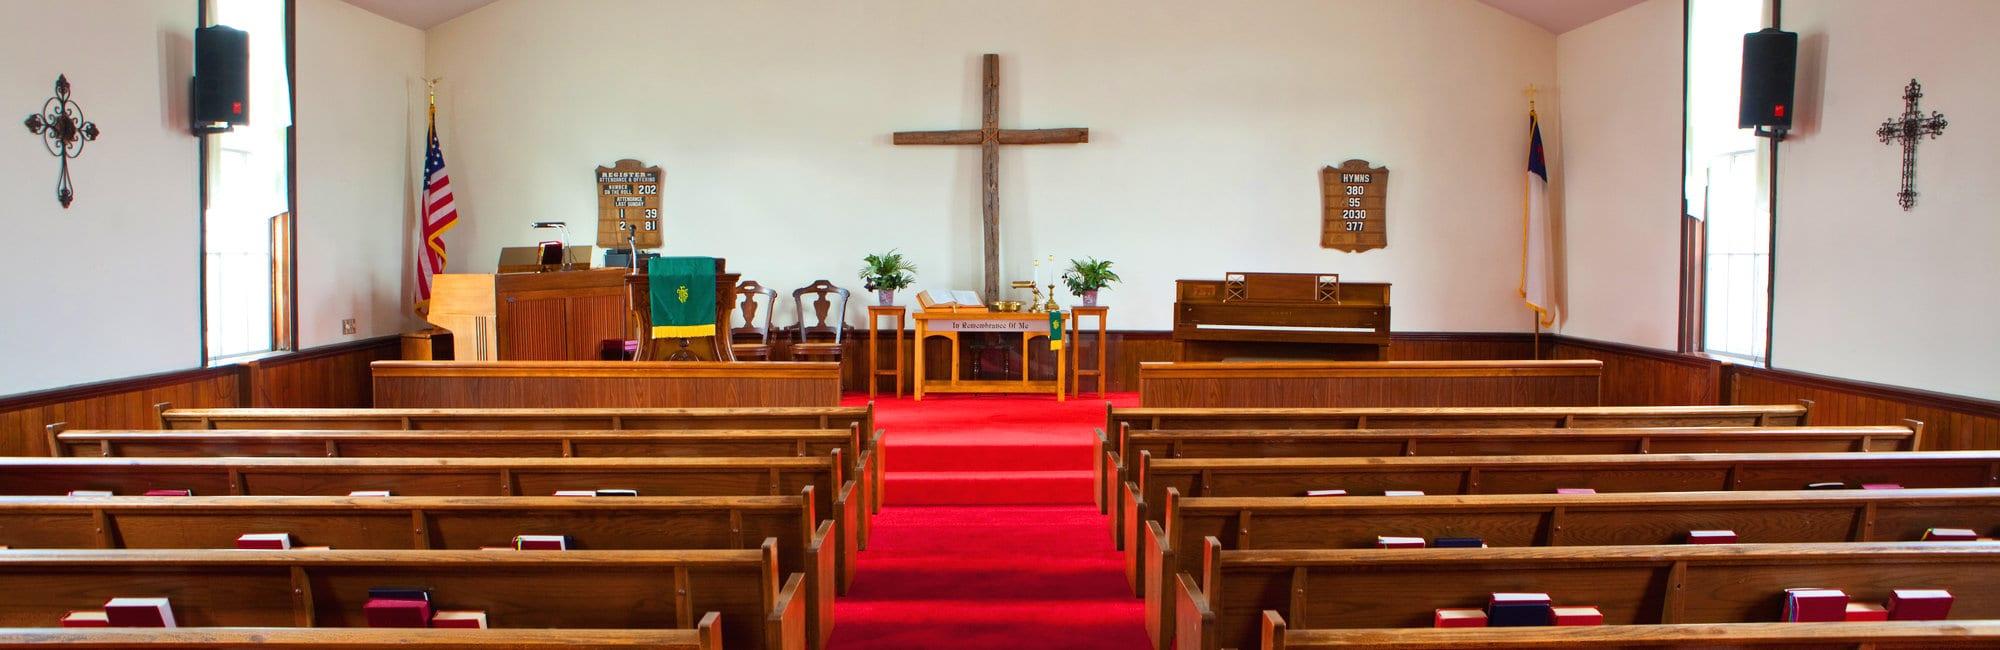 slide-churches-directory